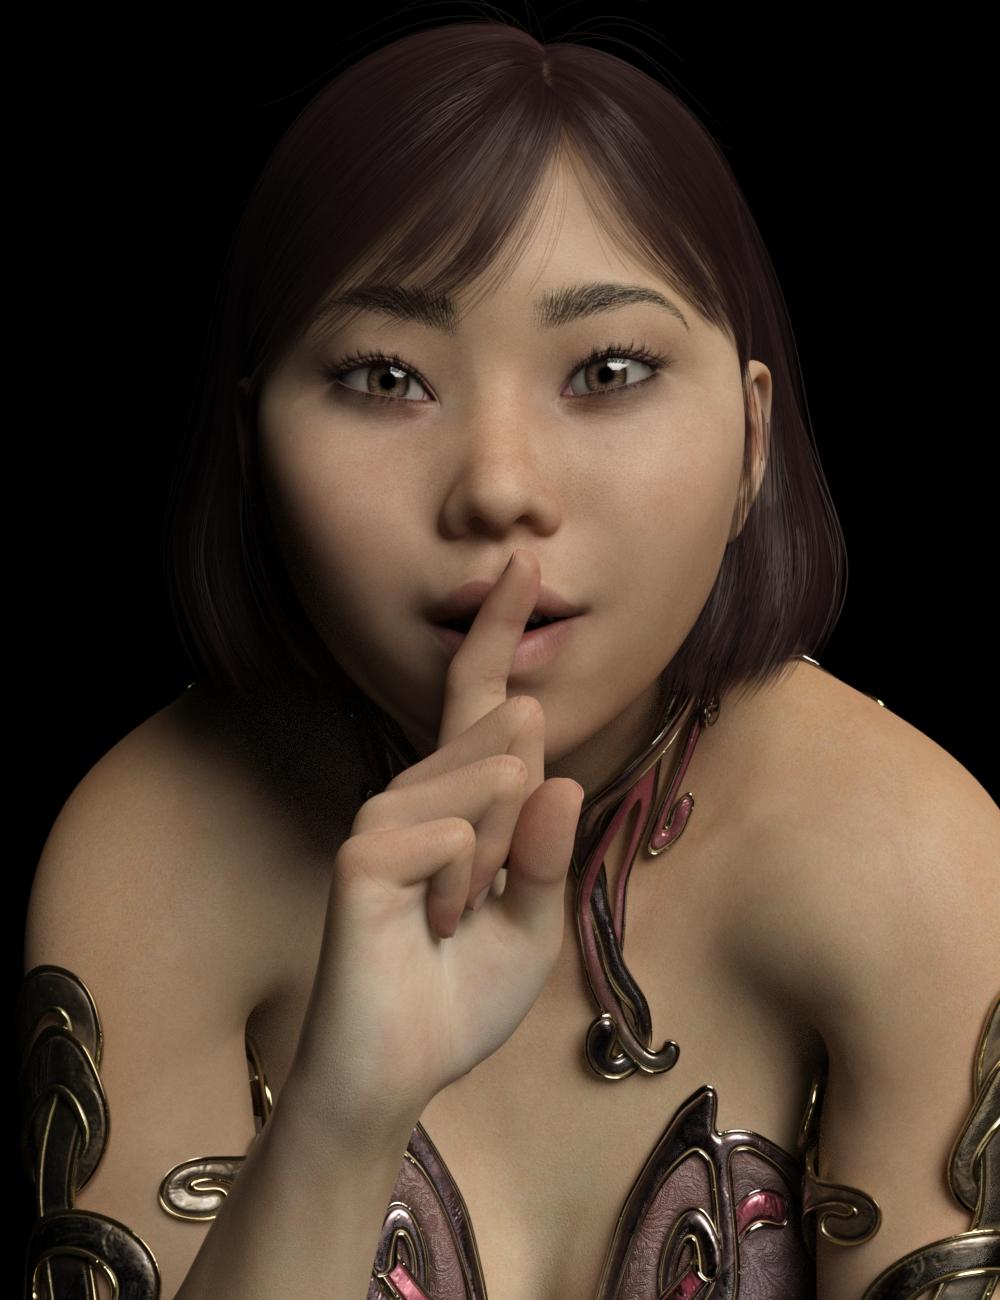 Sakiya for Genesis 8 Female by: Warloc, 3D Models by Daz 3D